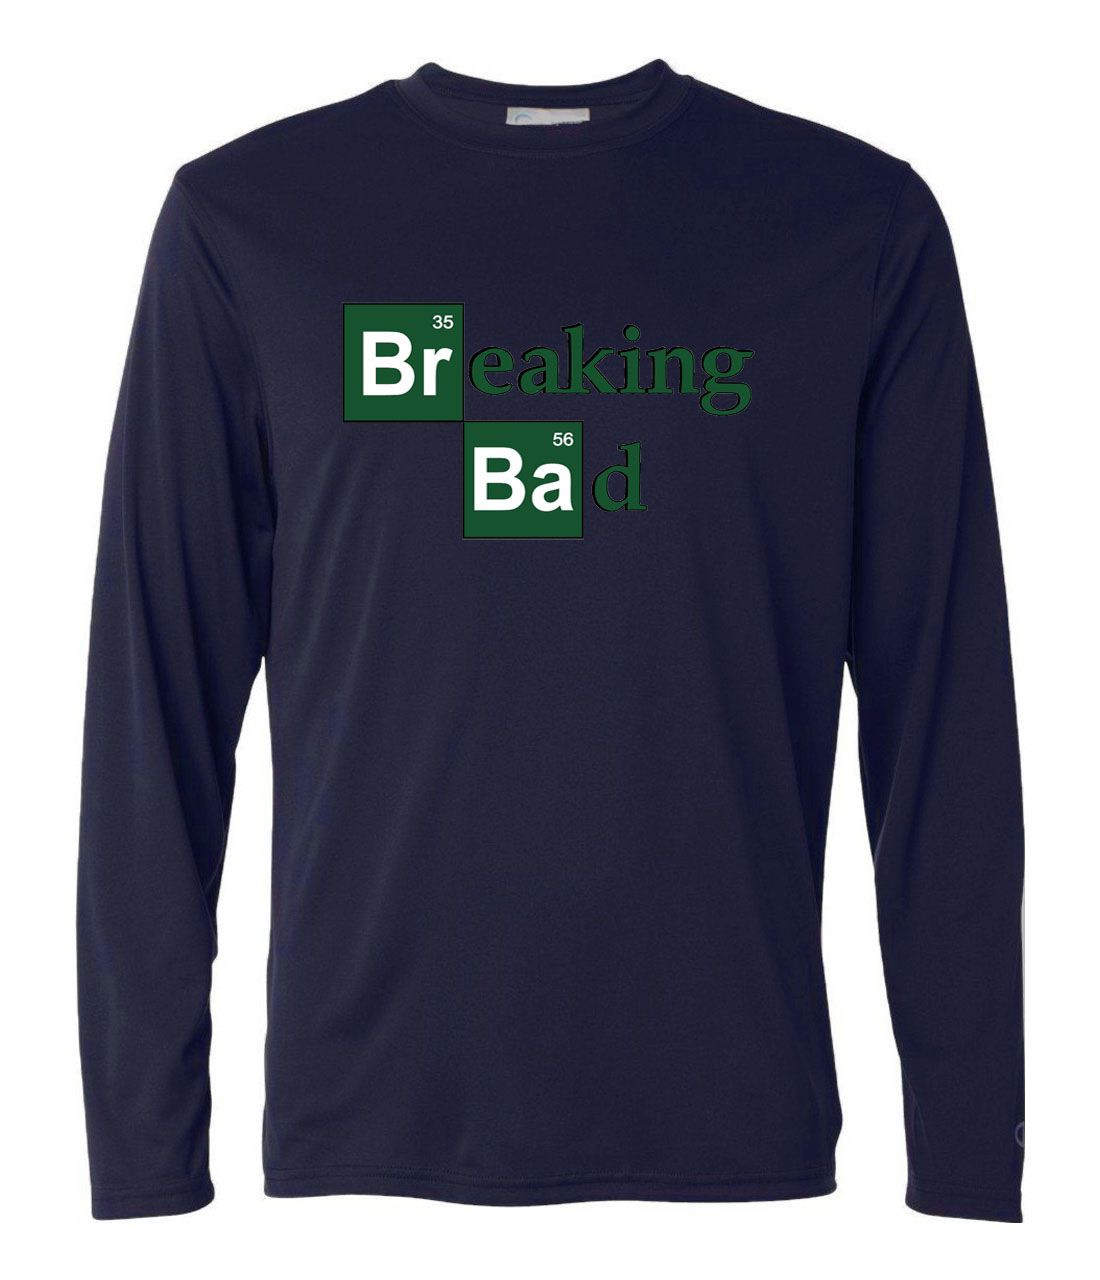 breaking bad men letters printed t shirt fashion long sleeve camisetas men 2019 Los Pollos Hermanos hip-hop harajuku brand tees